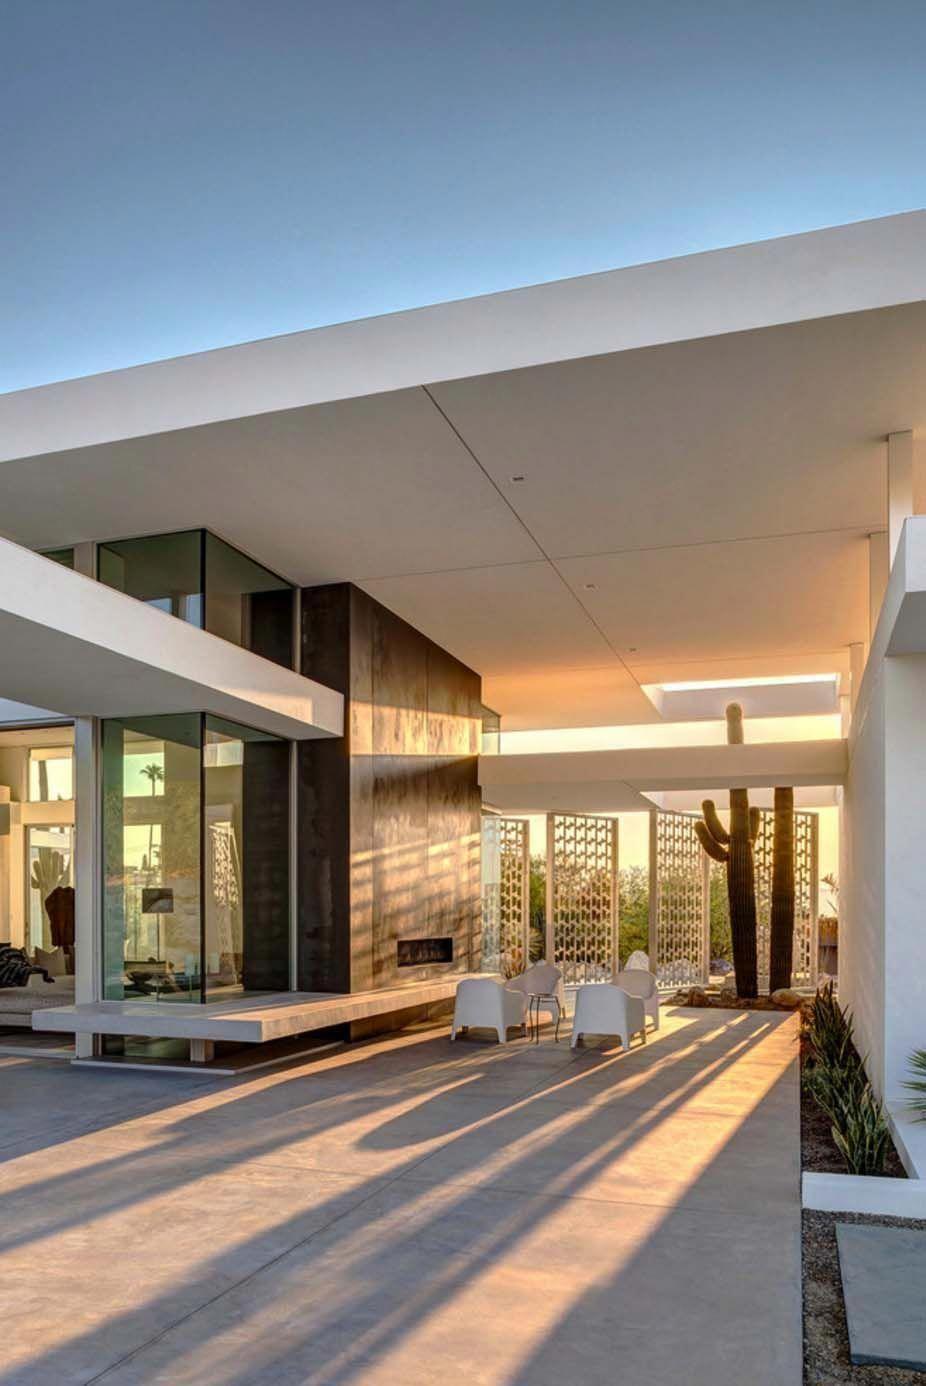 Visionary midcentury modern home piercing the palm springs desert